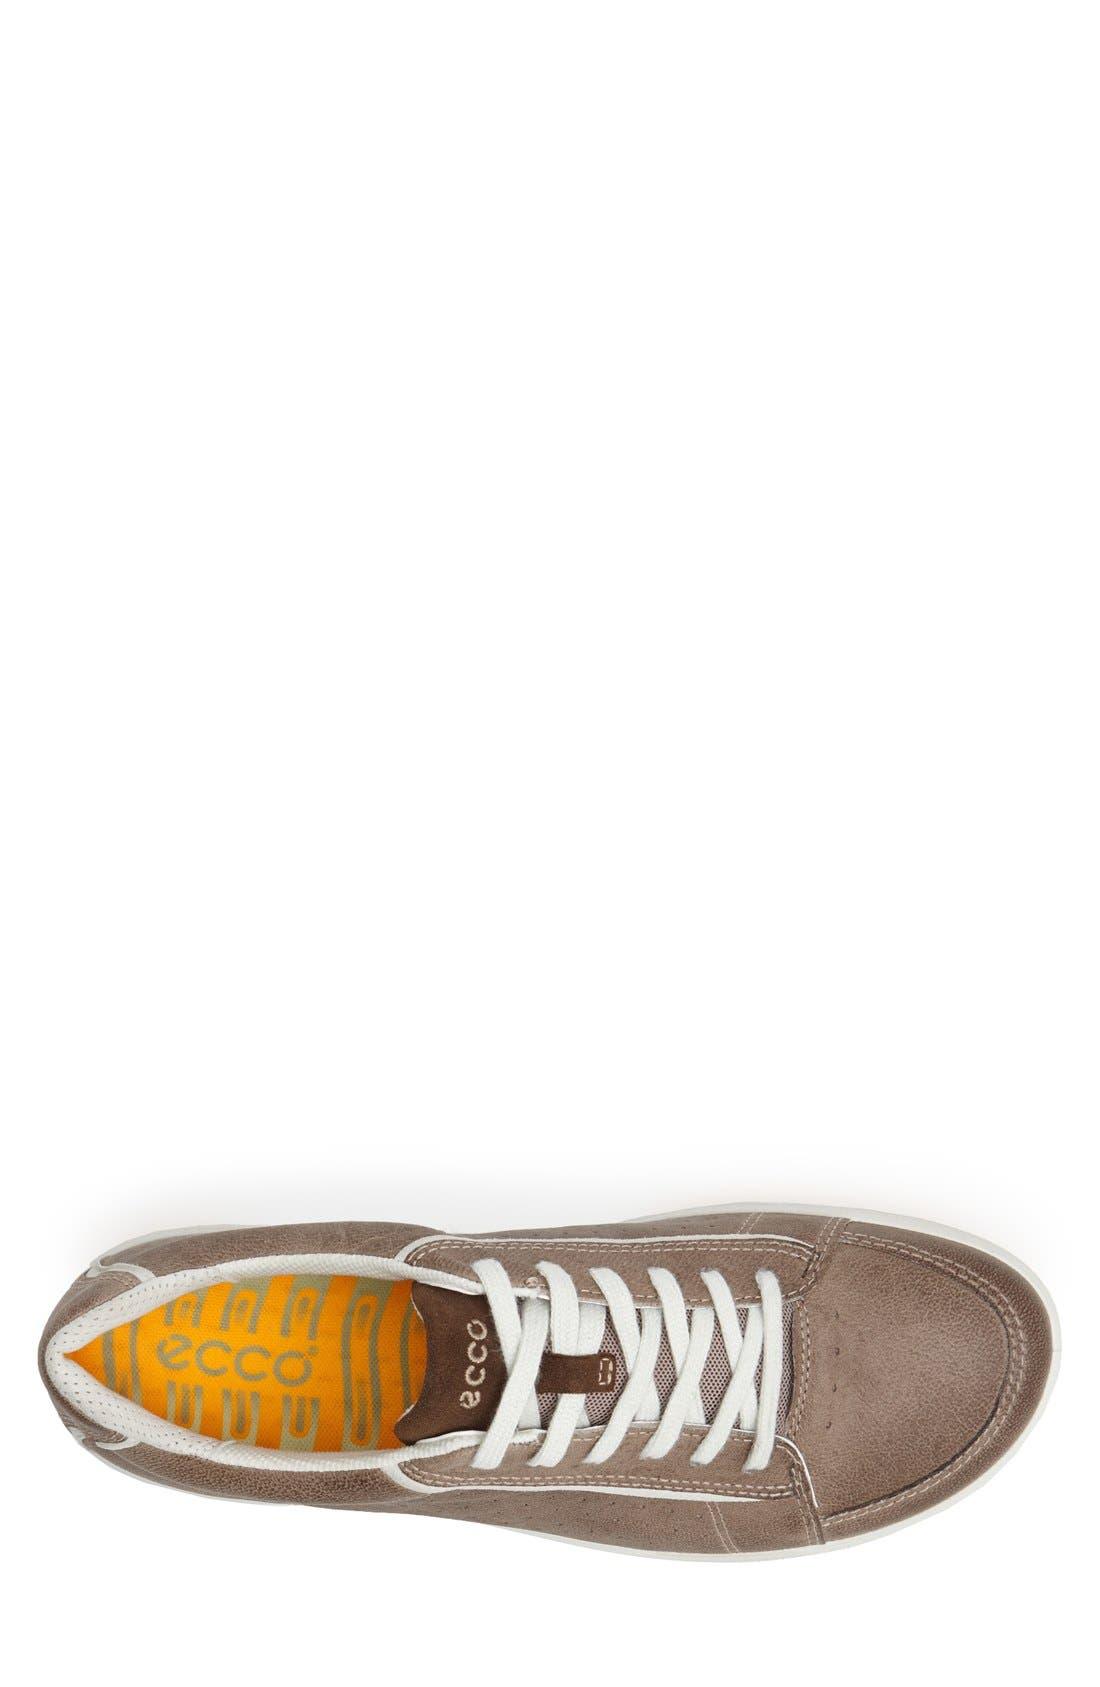 Alternate Image 3  - ECCO 'Eldon' Sneaker (Men)